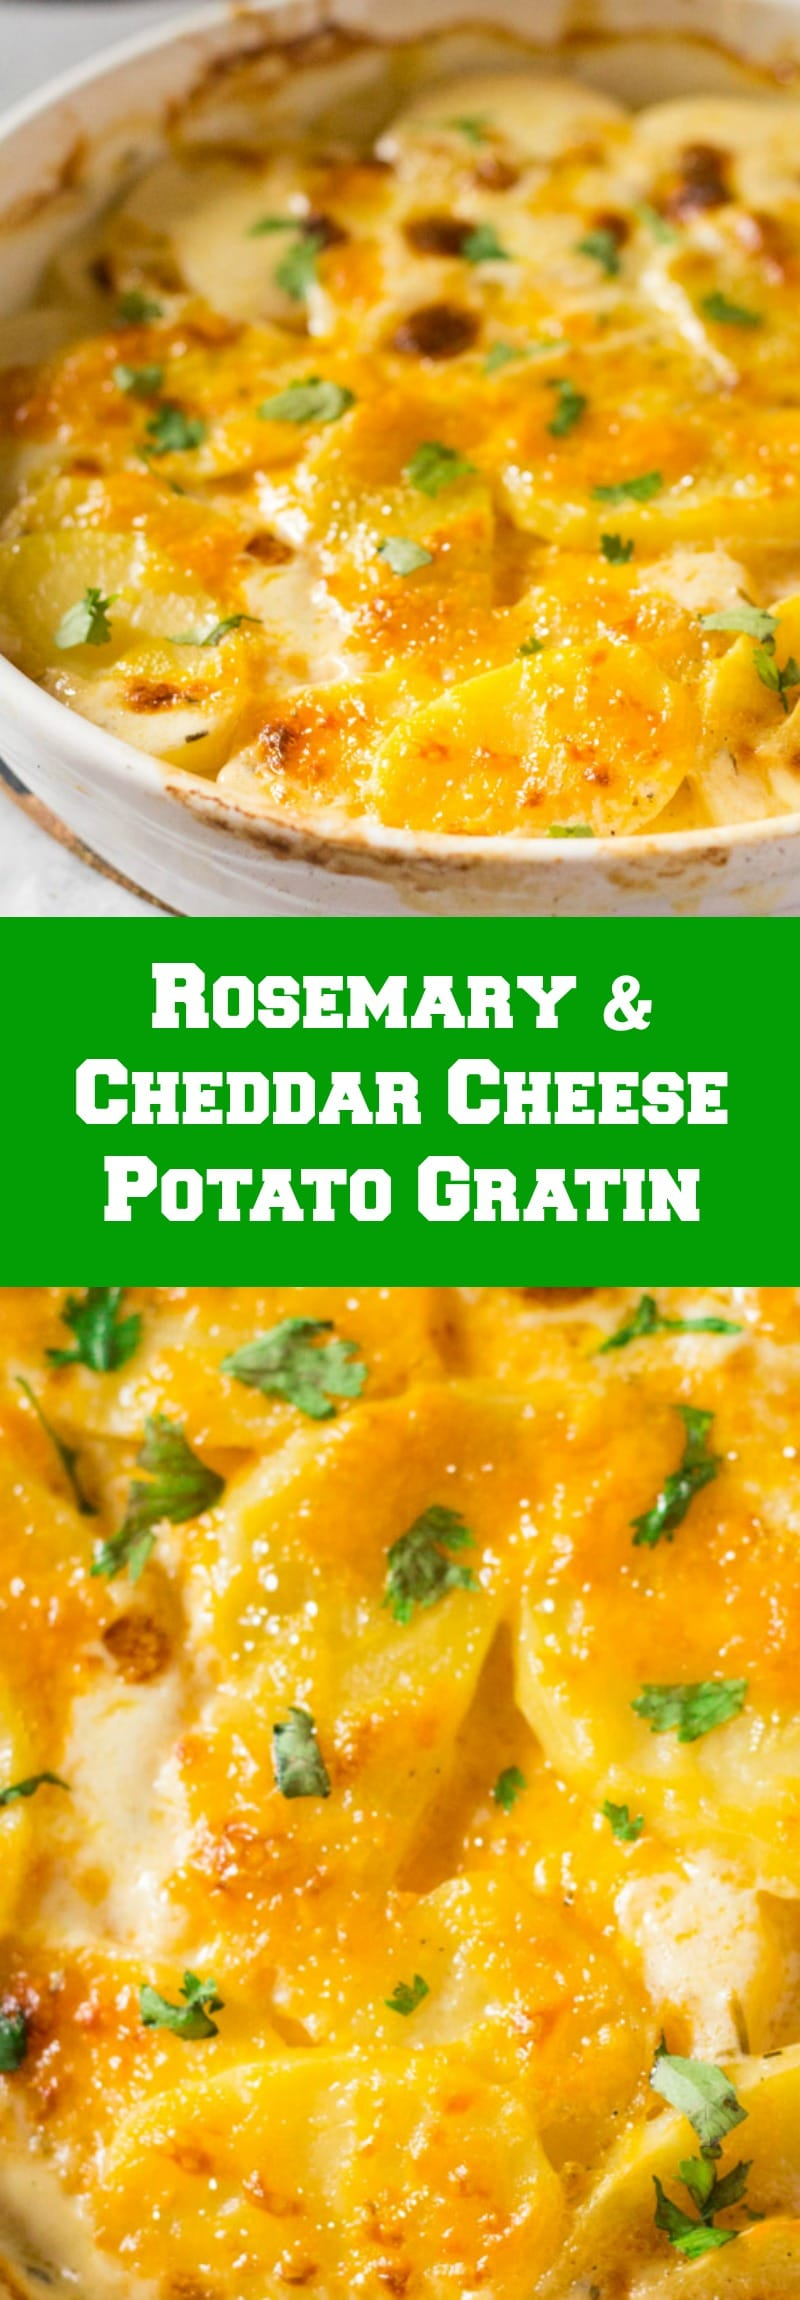 Rosemary & Cheddar Cheese Potato Gratin